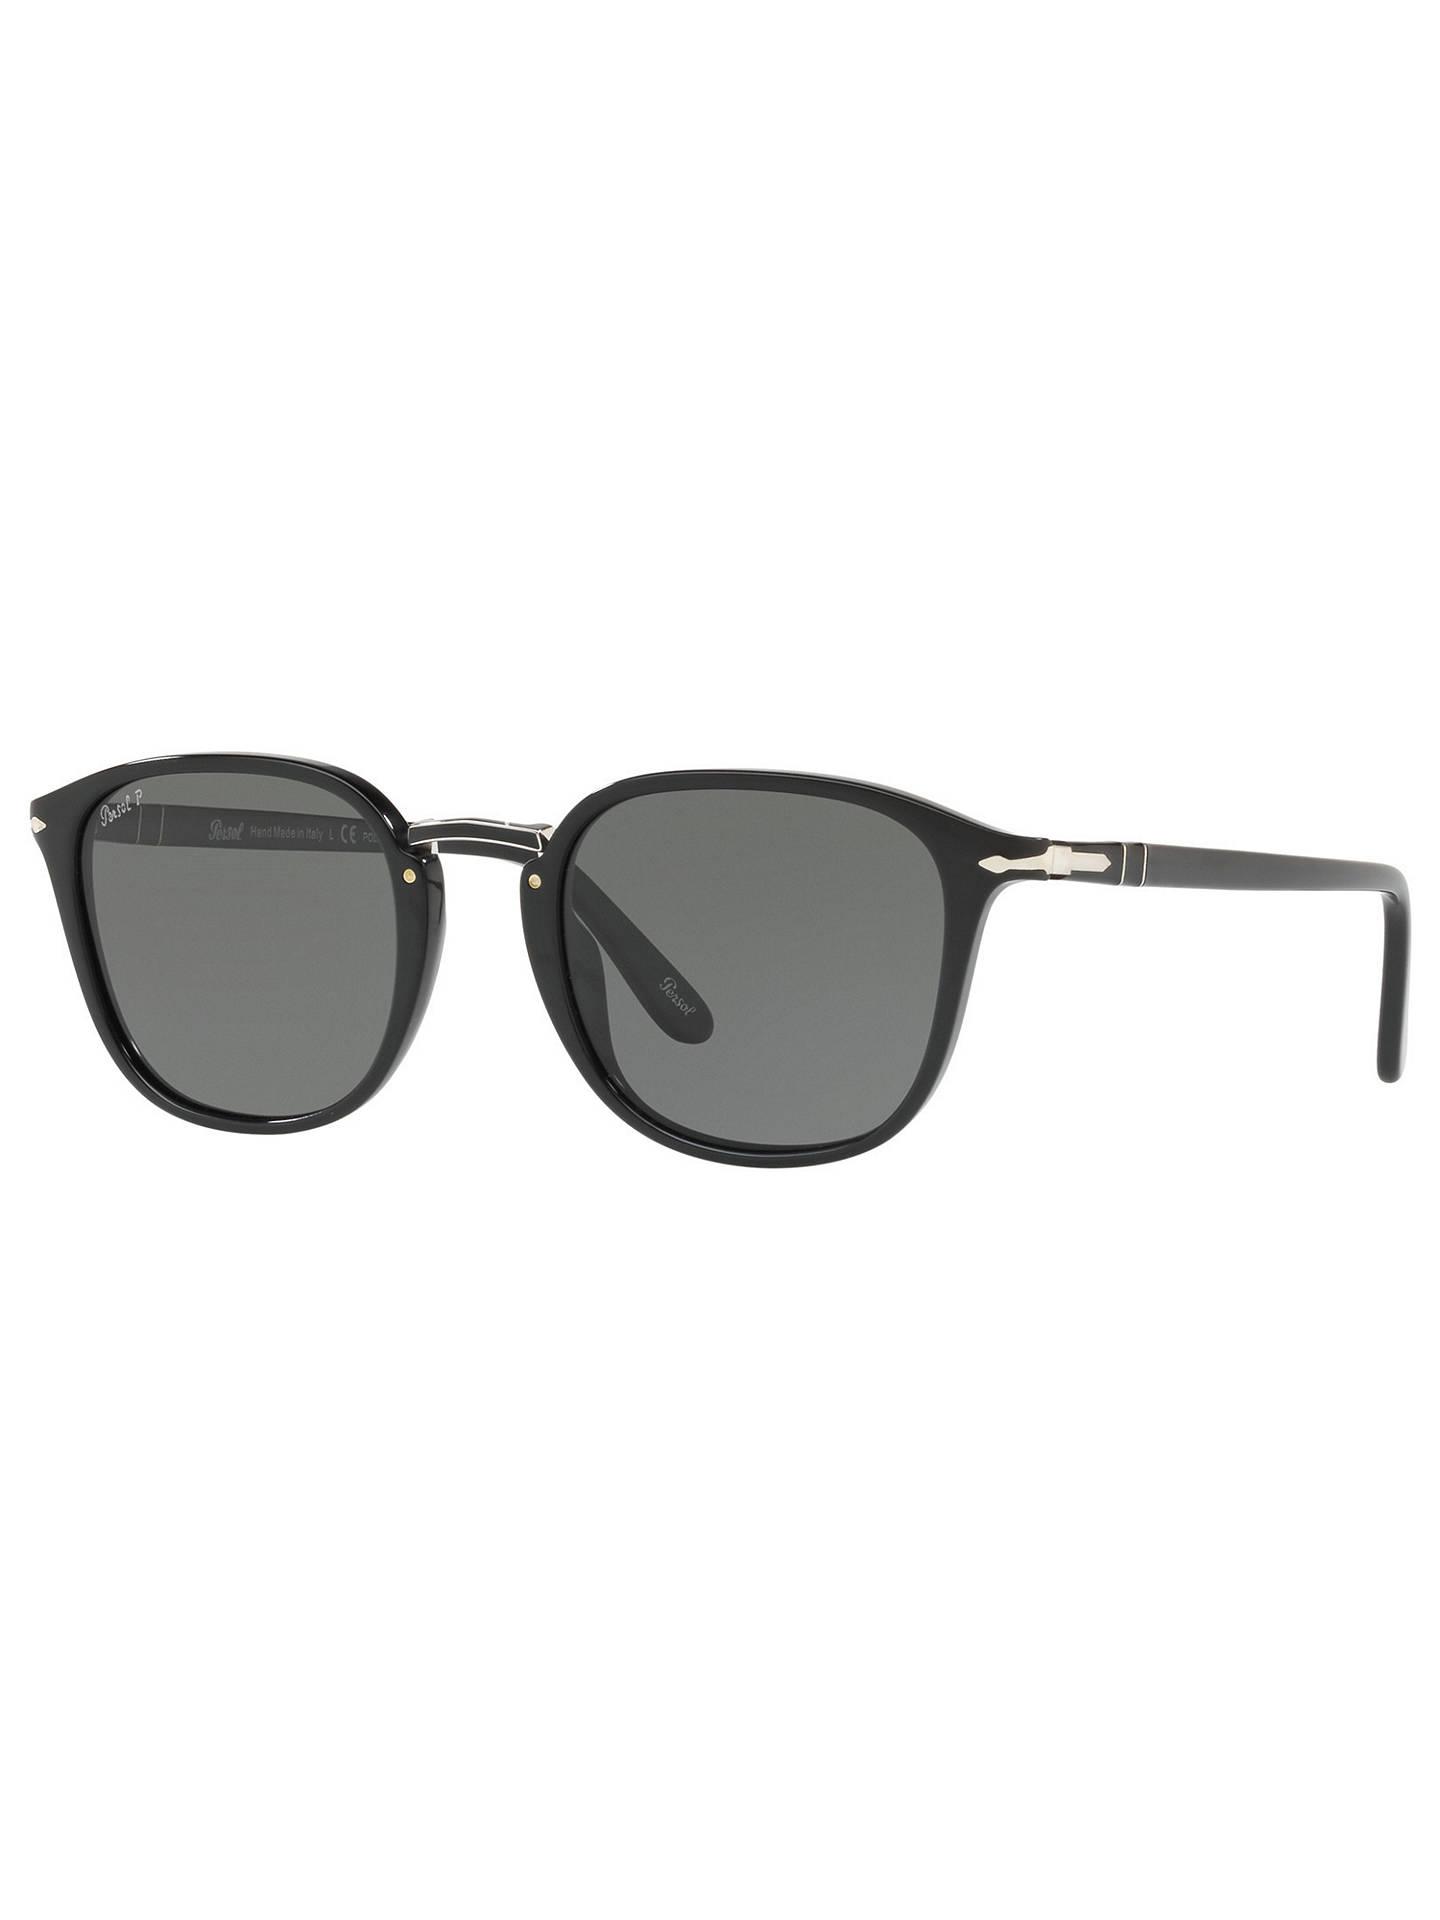 3f0ab7ed112fe Persol PO3186S Polarised Square Sunglasses at John Lewis   Partners